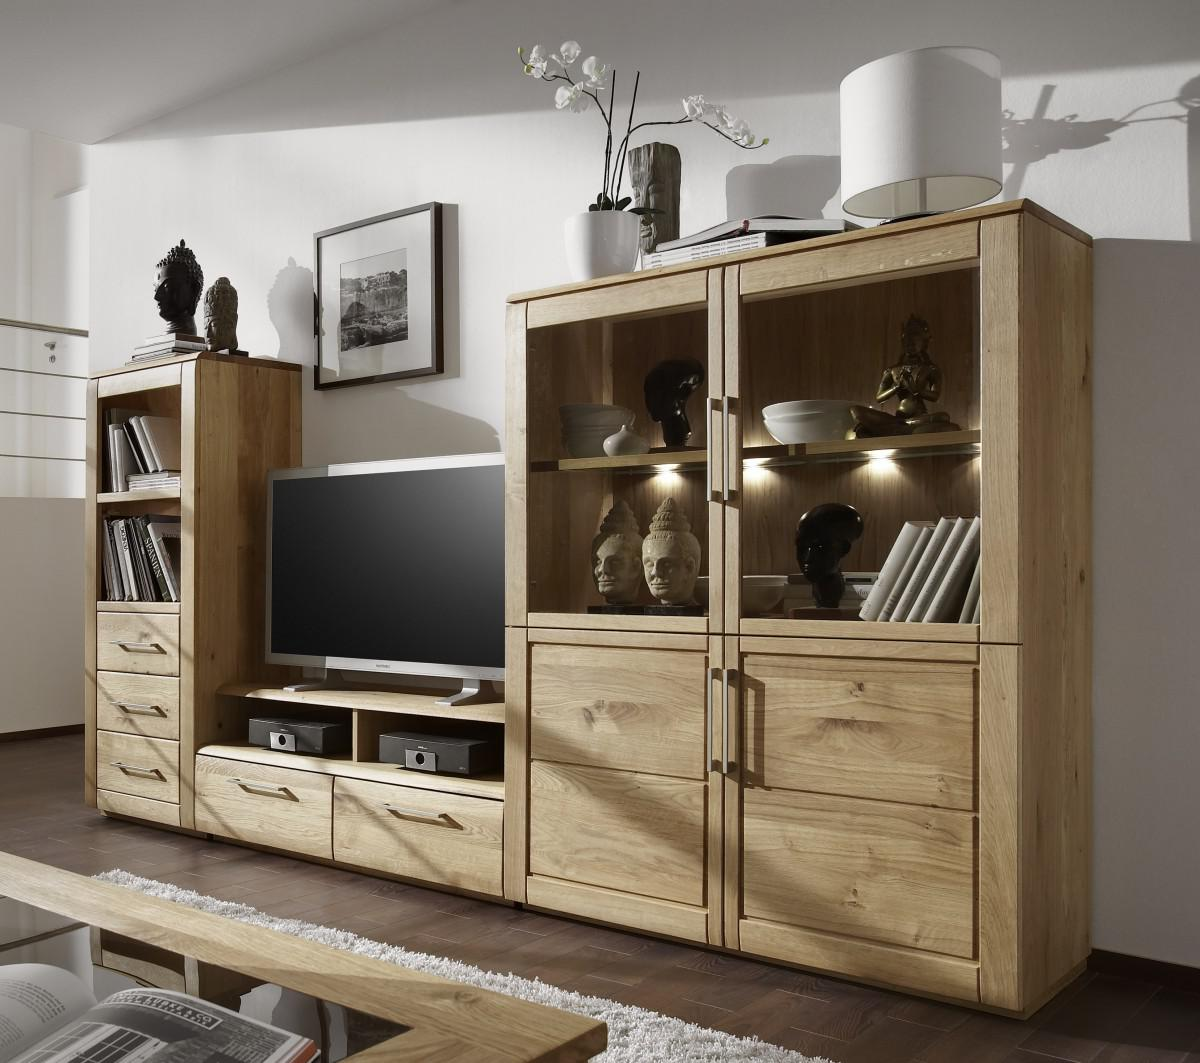 Cool Ordinaire Wohnwand Tv Fernsehwand Wildeiche Gelt Massiv Natur Rustikal  With Wohnwand Zara